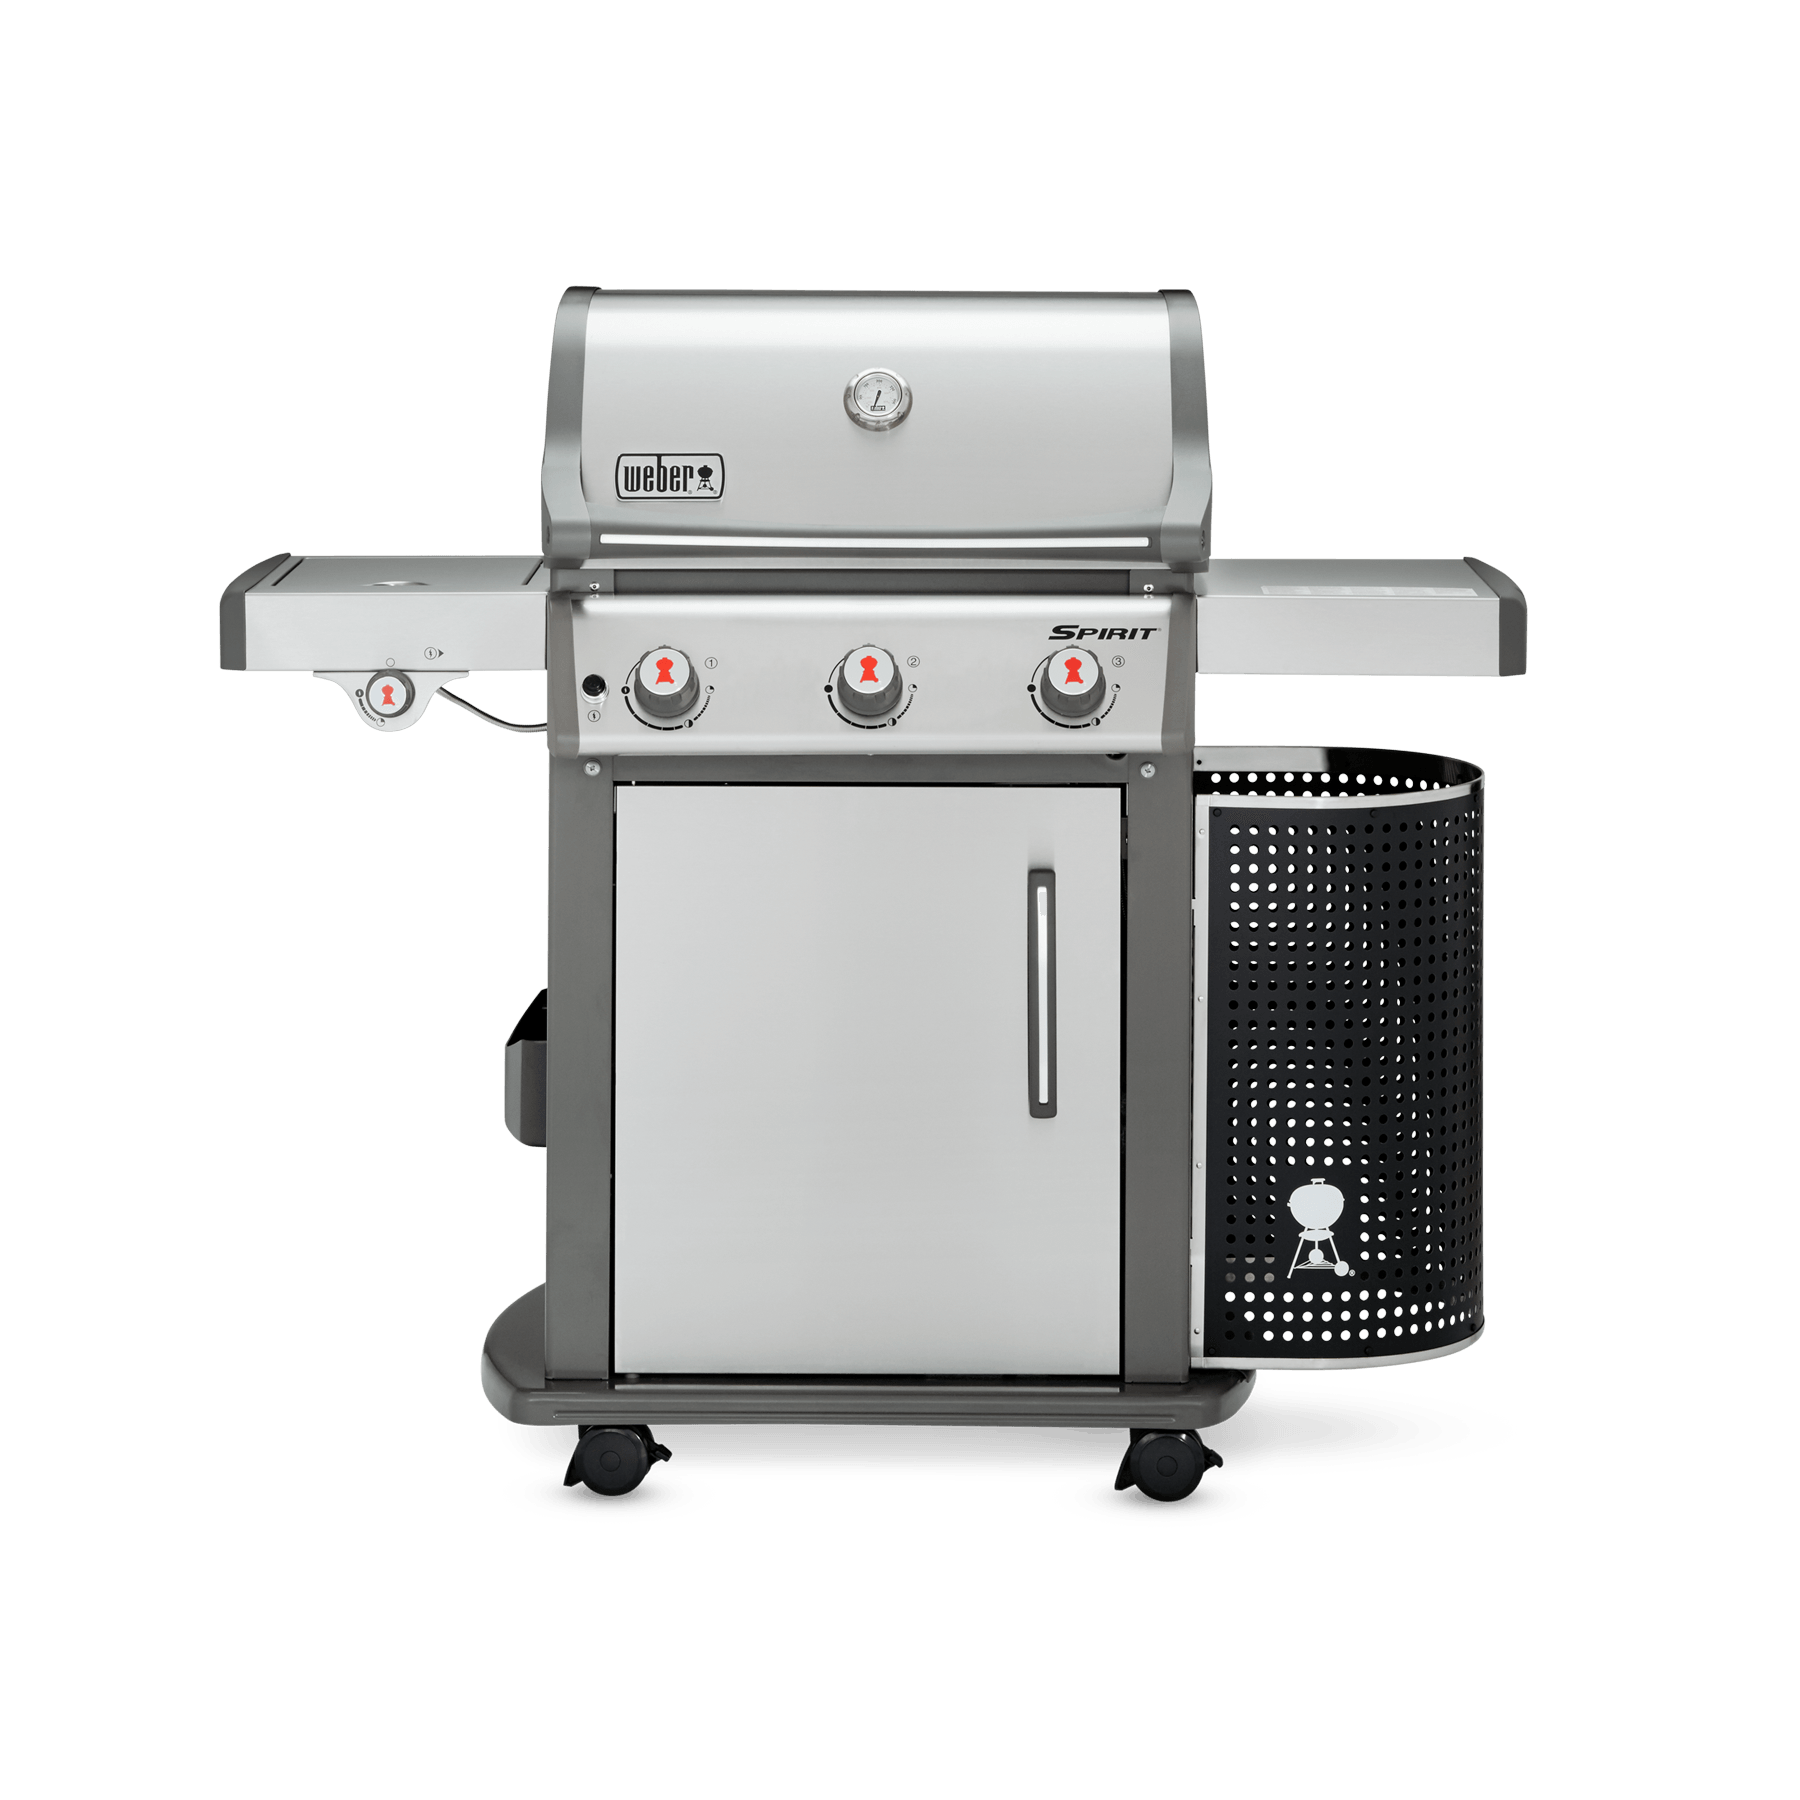 spirit original e 320 gbs gasbarbecue spirit serie gasbarbecues. Black Bedroom Furniture Sets. Home Design Ideas